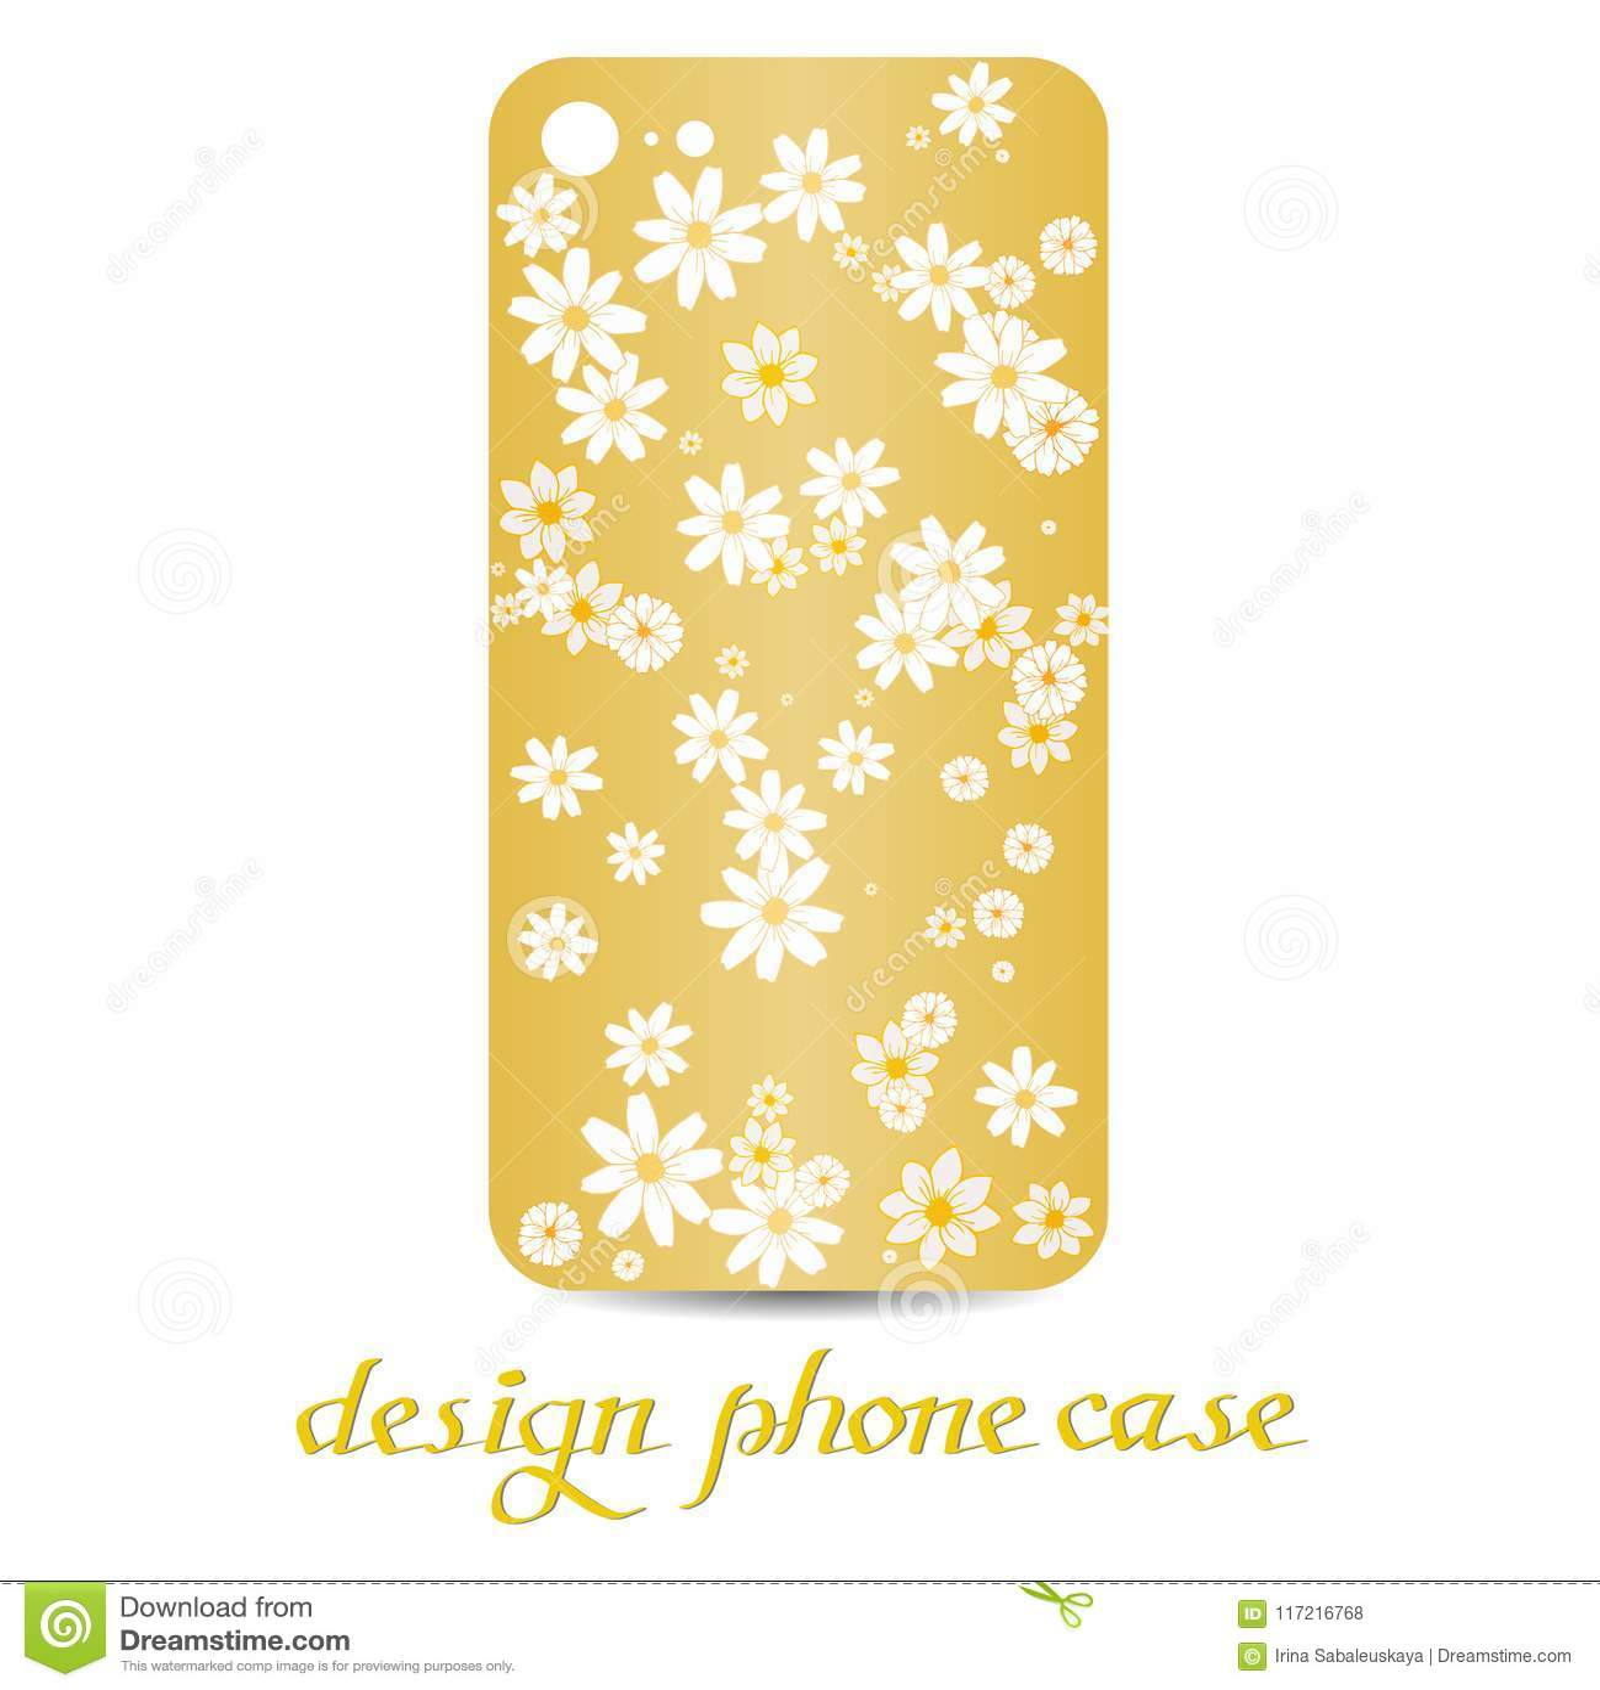 Design phone case. Phone cases are floral decorated. Vintage decorative elements.